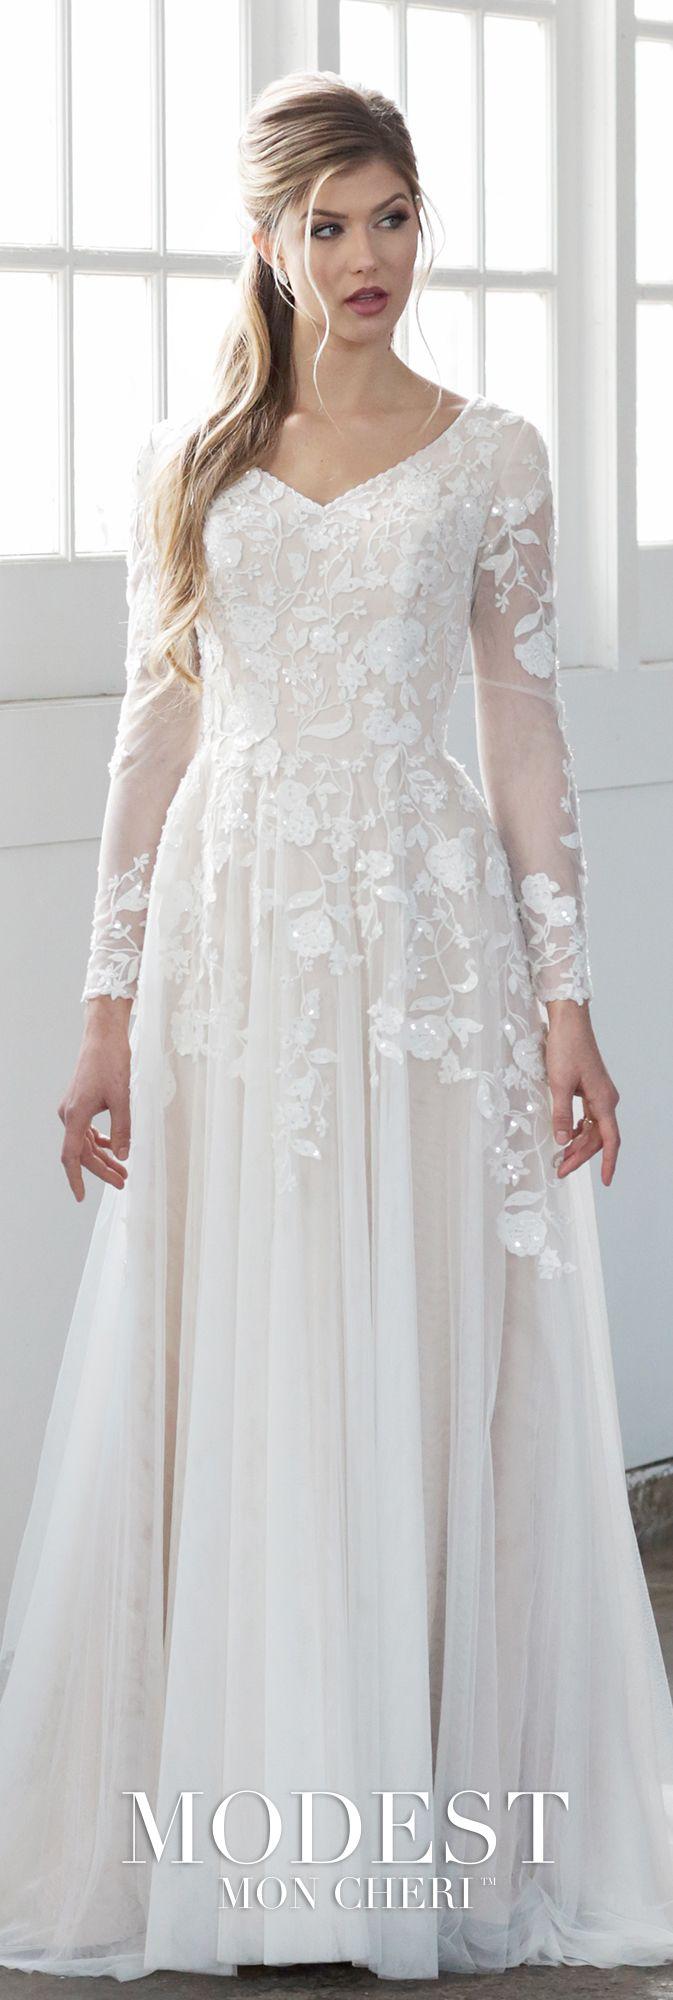 Conservative wedding dresses  Whimsical Conservative LongSleeve ALine Wedding Dress  Passion